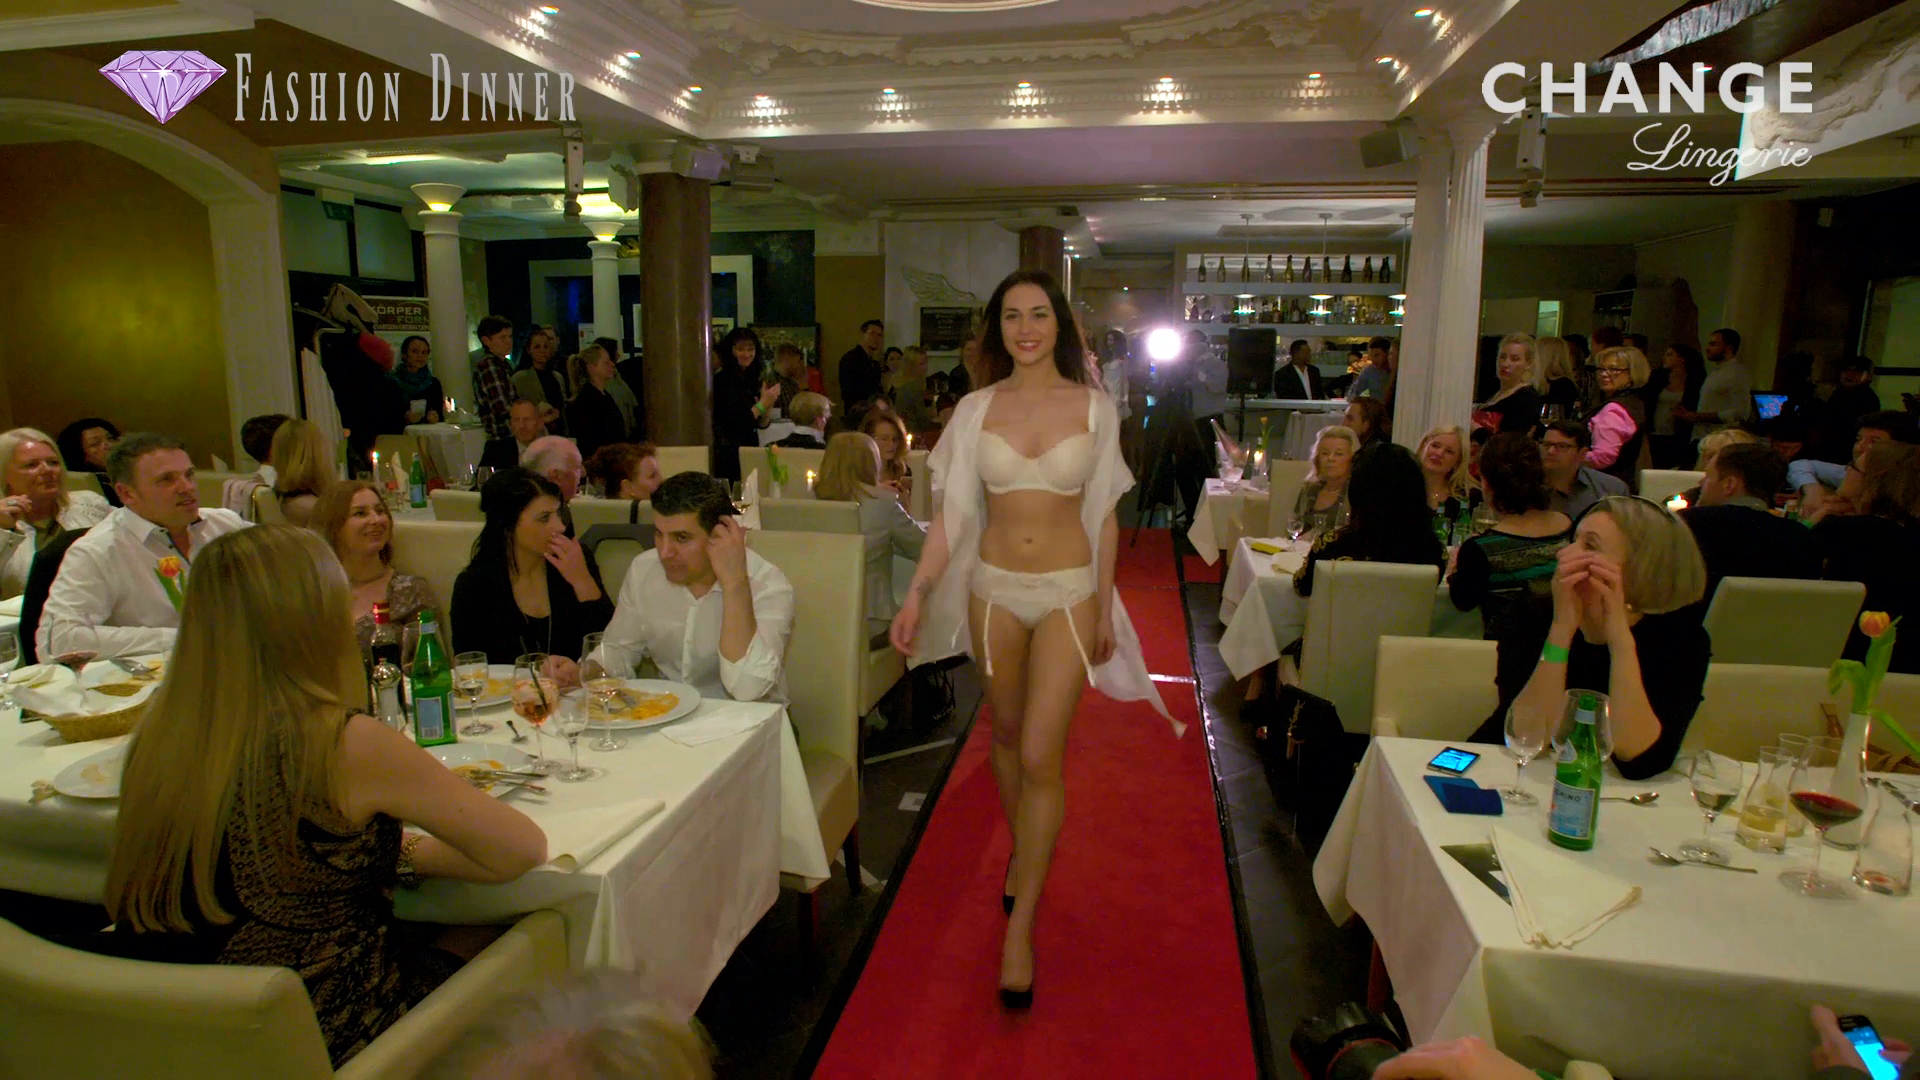 FASHION-DINNER | Change Lingerie